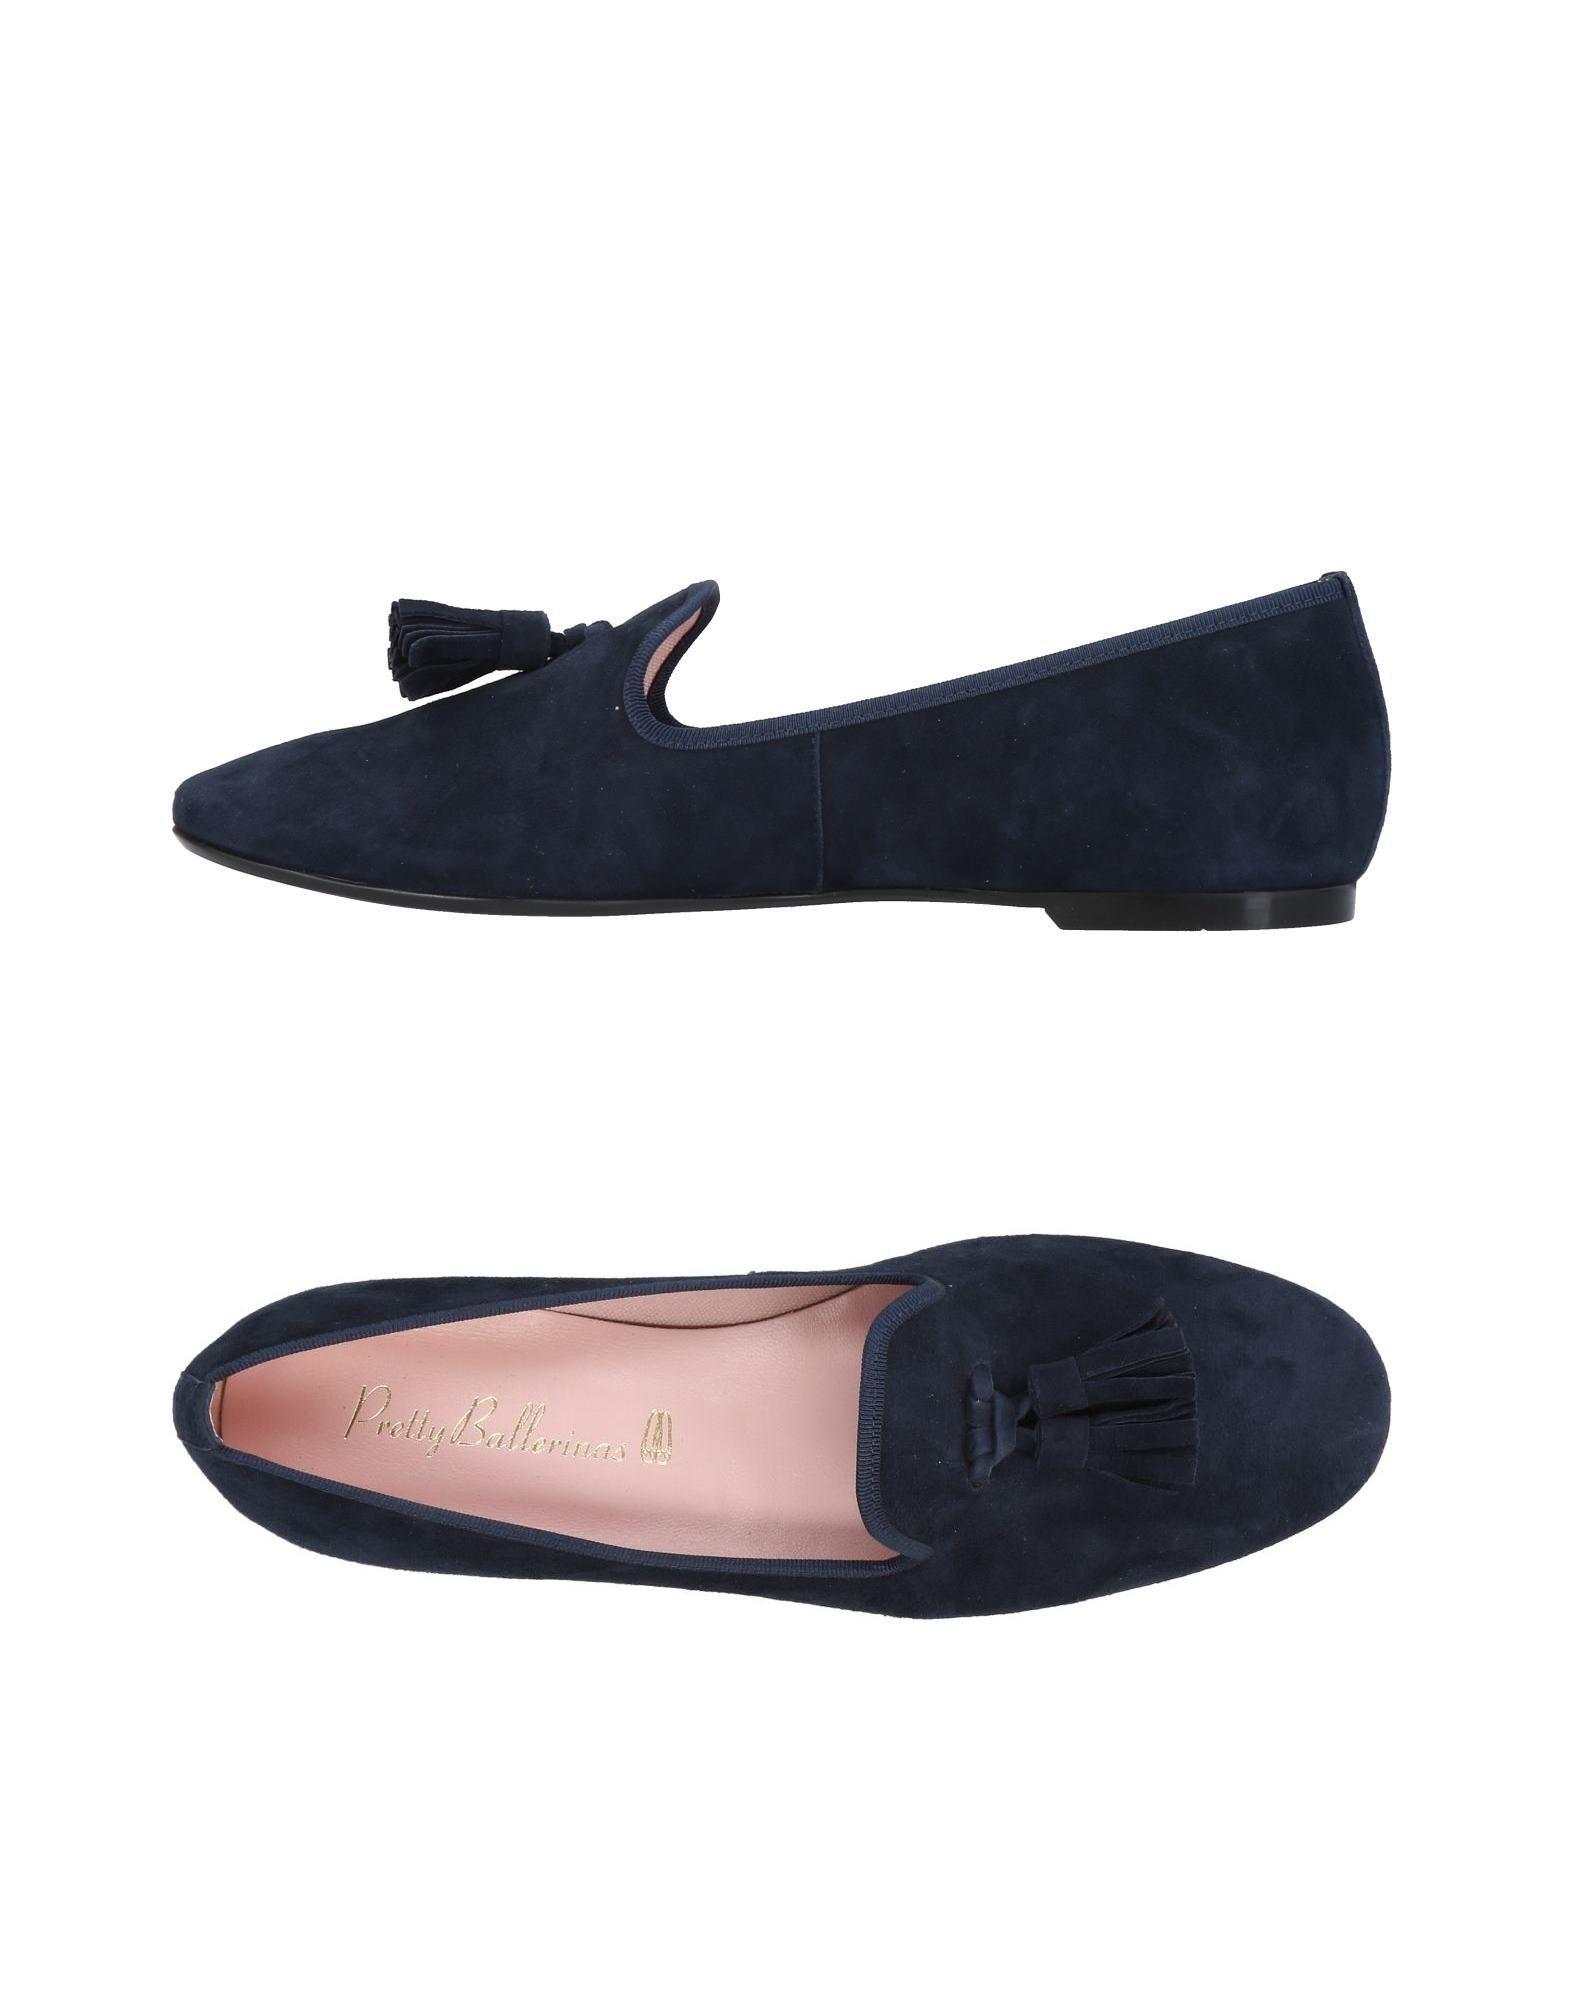 Pretty Ballerinas Mokassins Damen  11449355JRGut Schuhe aussehende strapazierfähige Schuhe 11449355JRGut 86b479